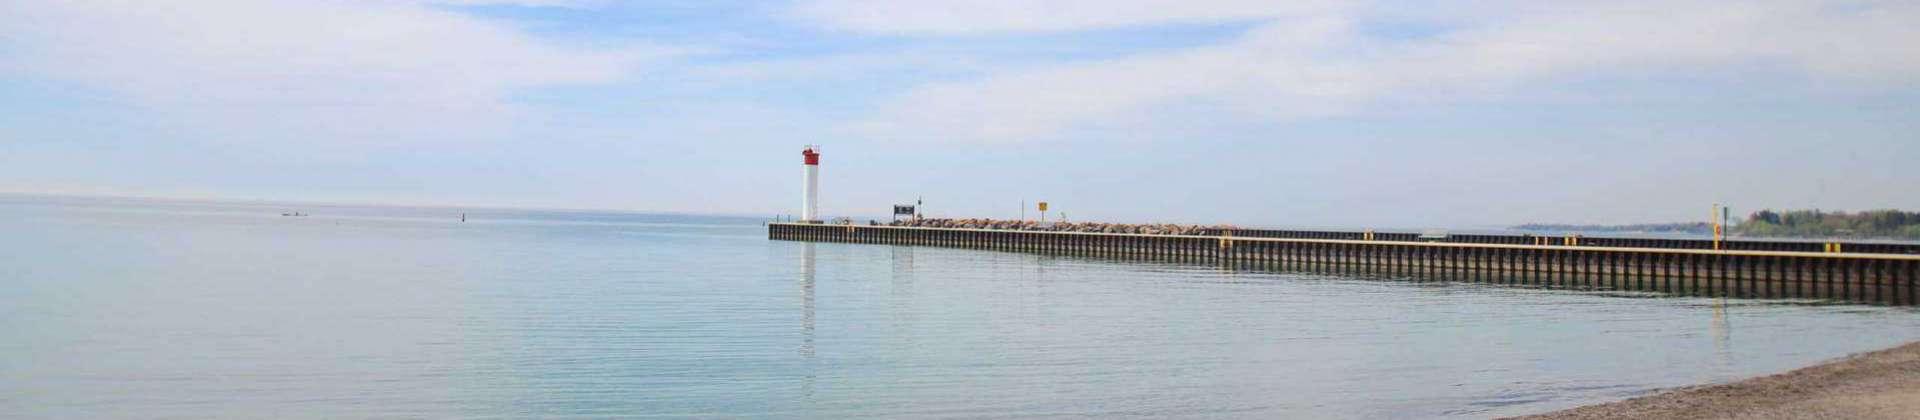 Whitby Ontario waterfront Durham Region